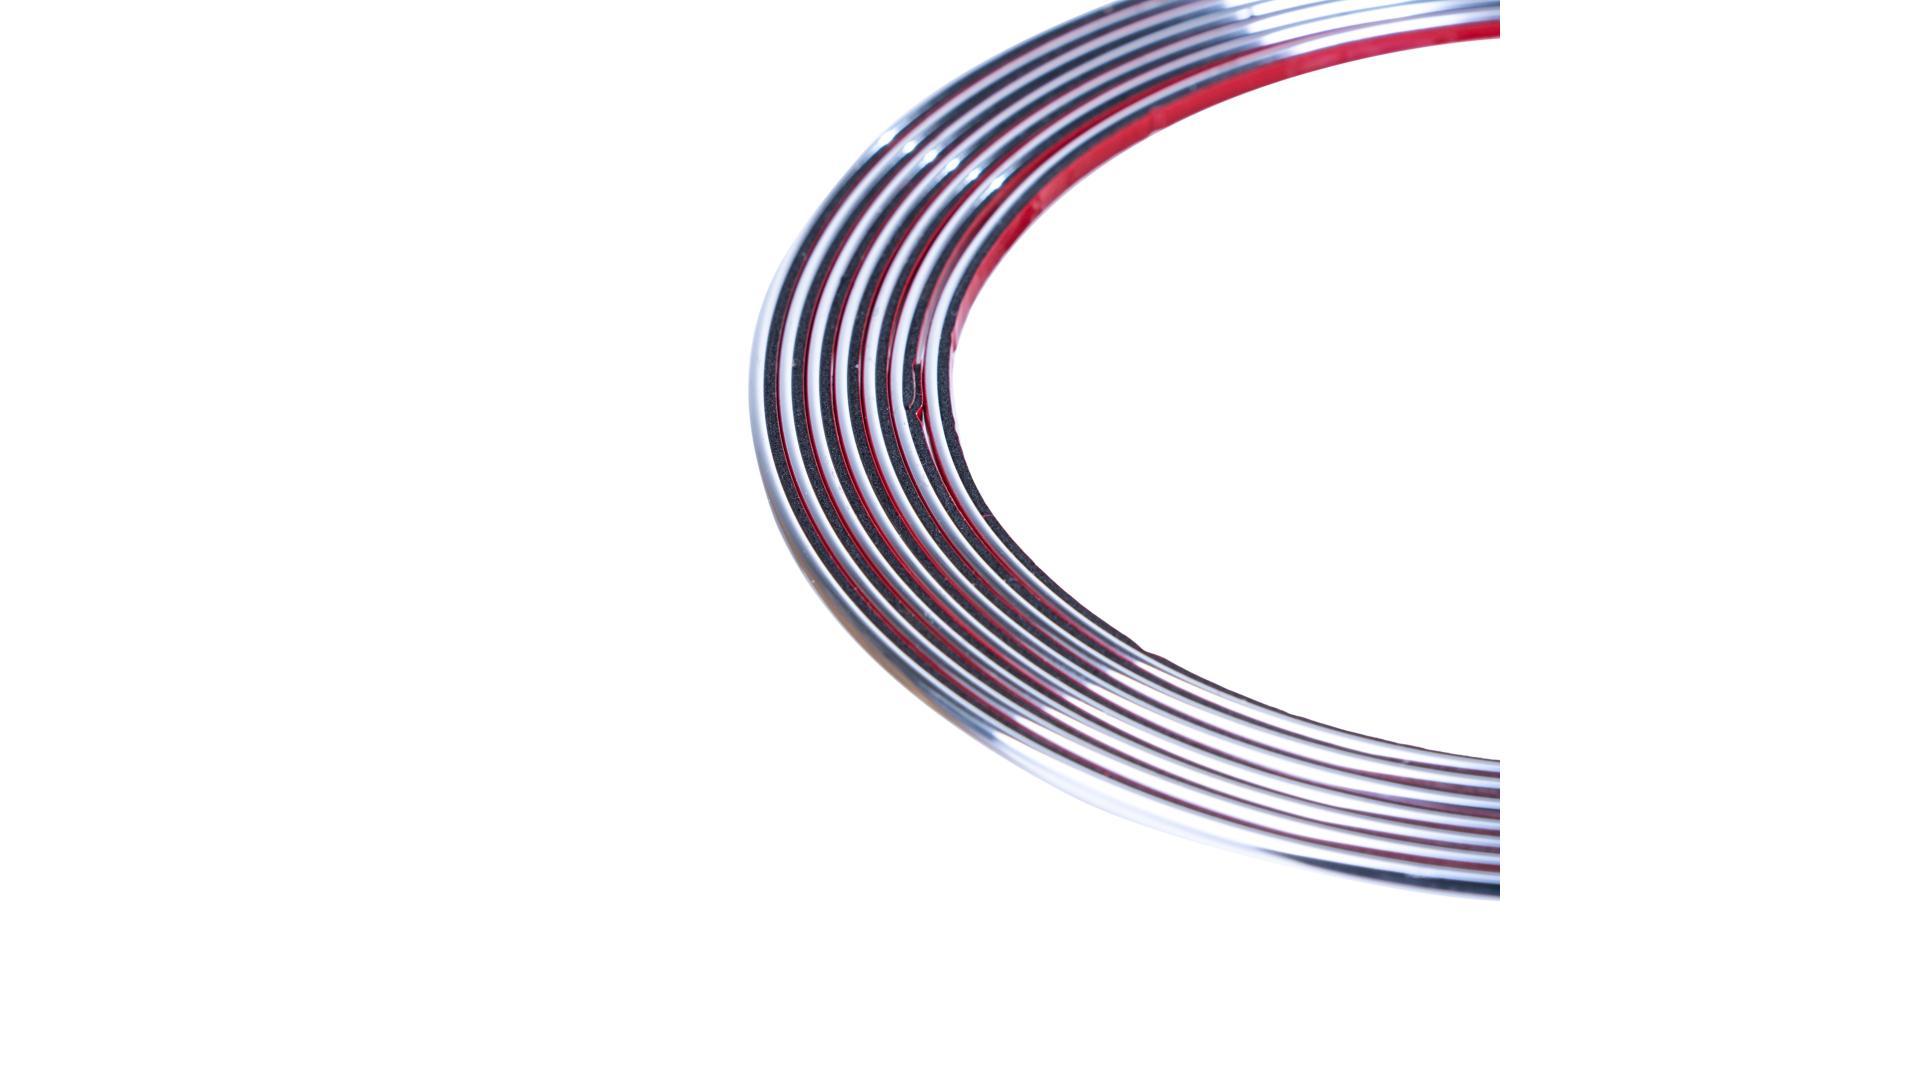 4CARS Chrómová lišta 3,5mm x 4m